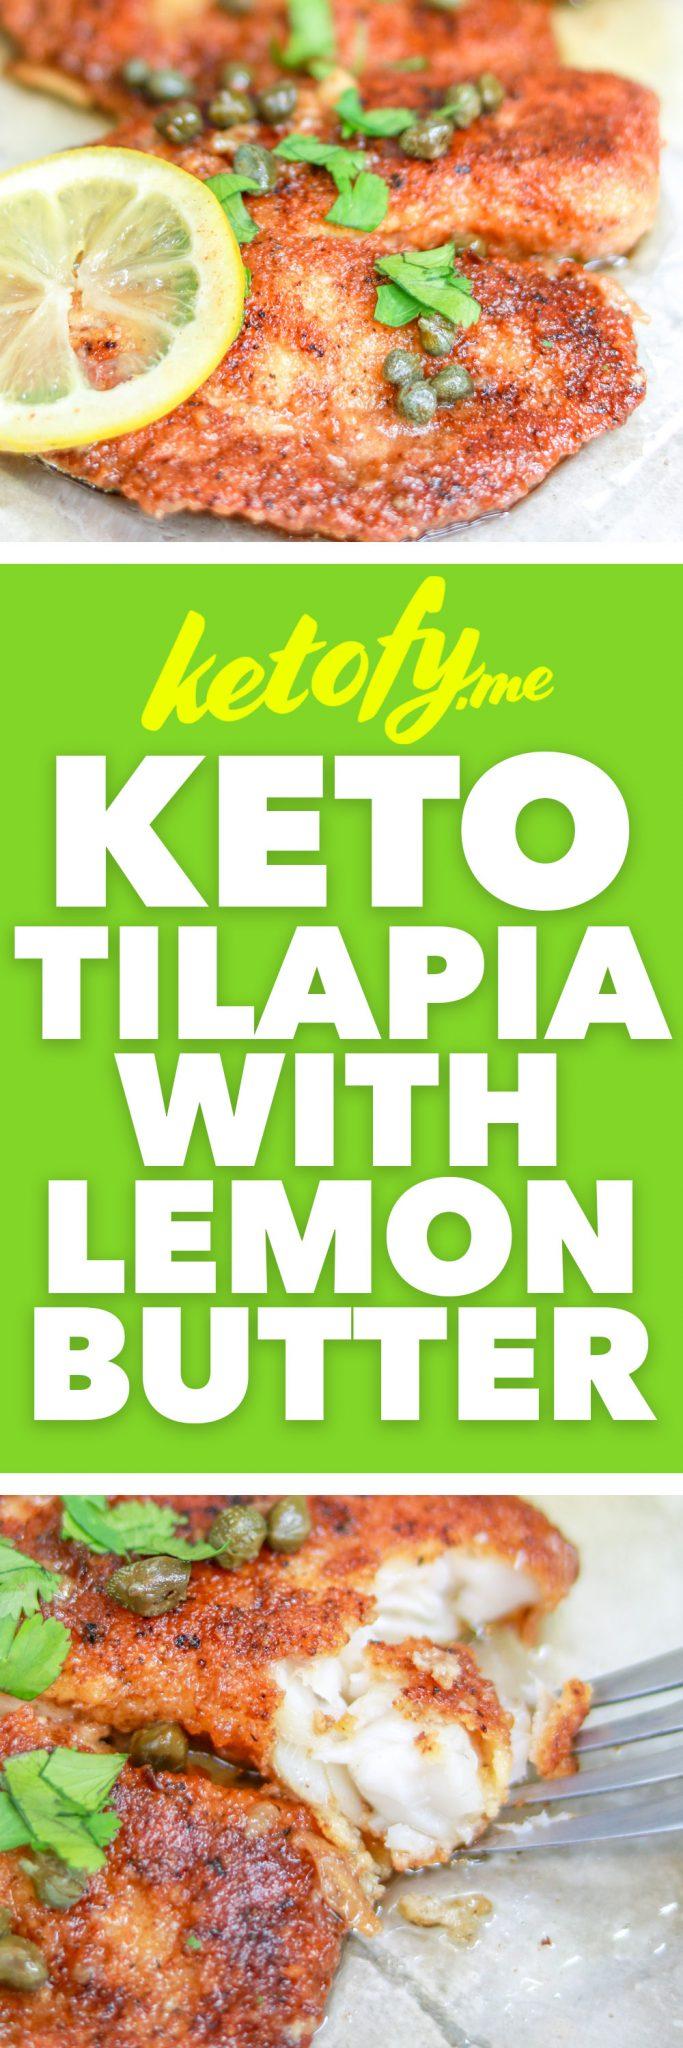 Ketofy.Me | Keto Fried Tilapia Lemon Butter | Gluten-Free | Nut-Free | https://ketofy.me